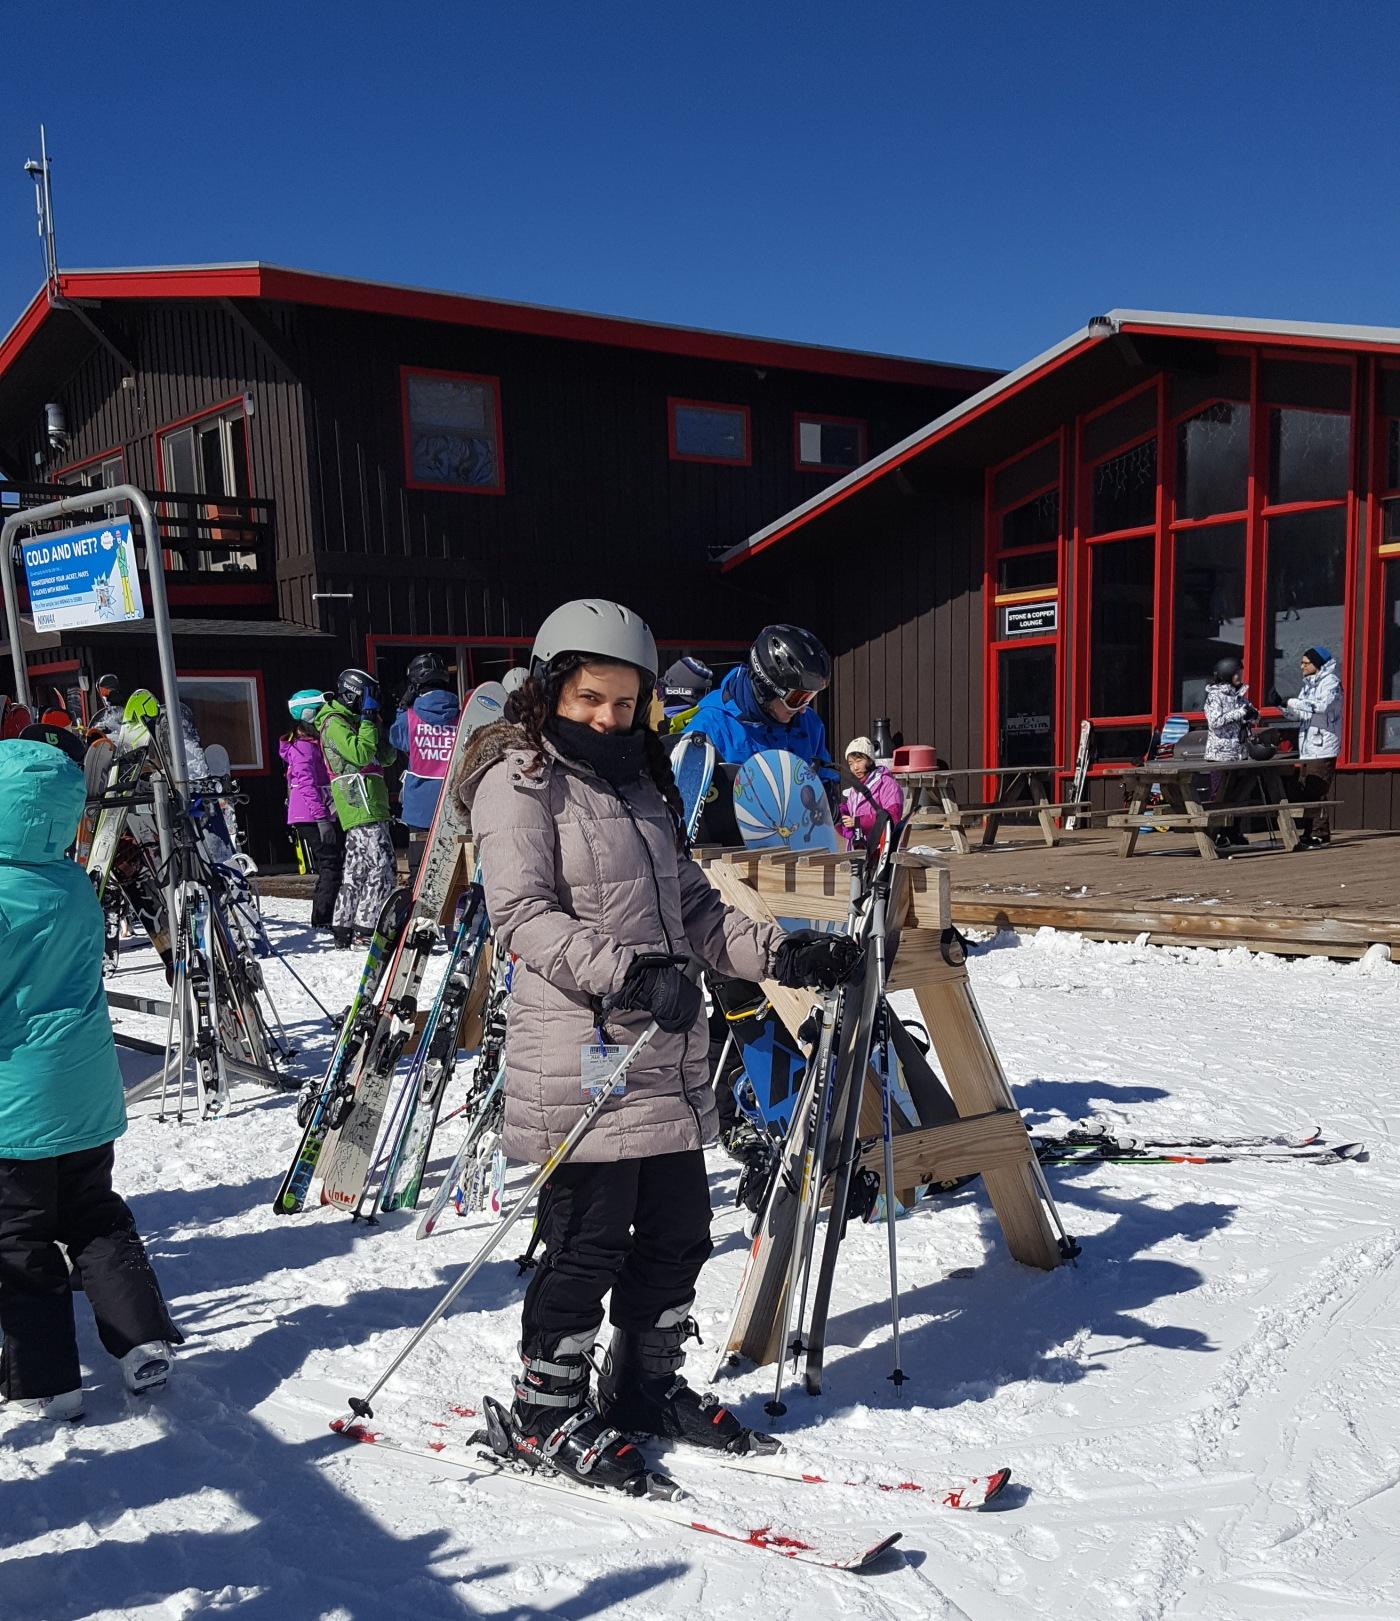 Ski - Lessons - Skiing